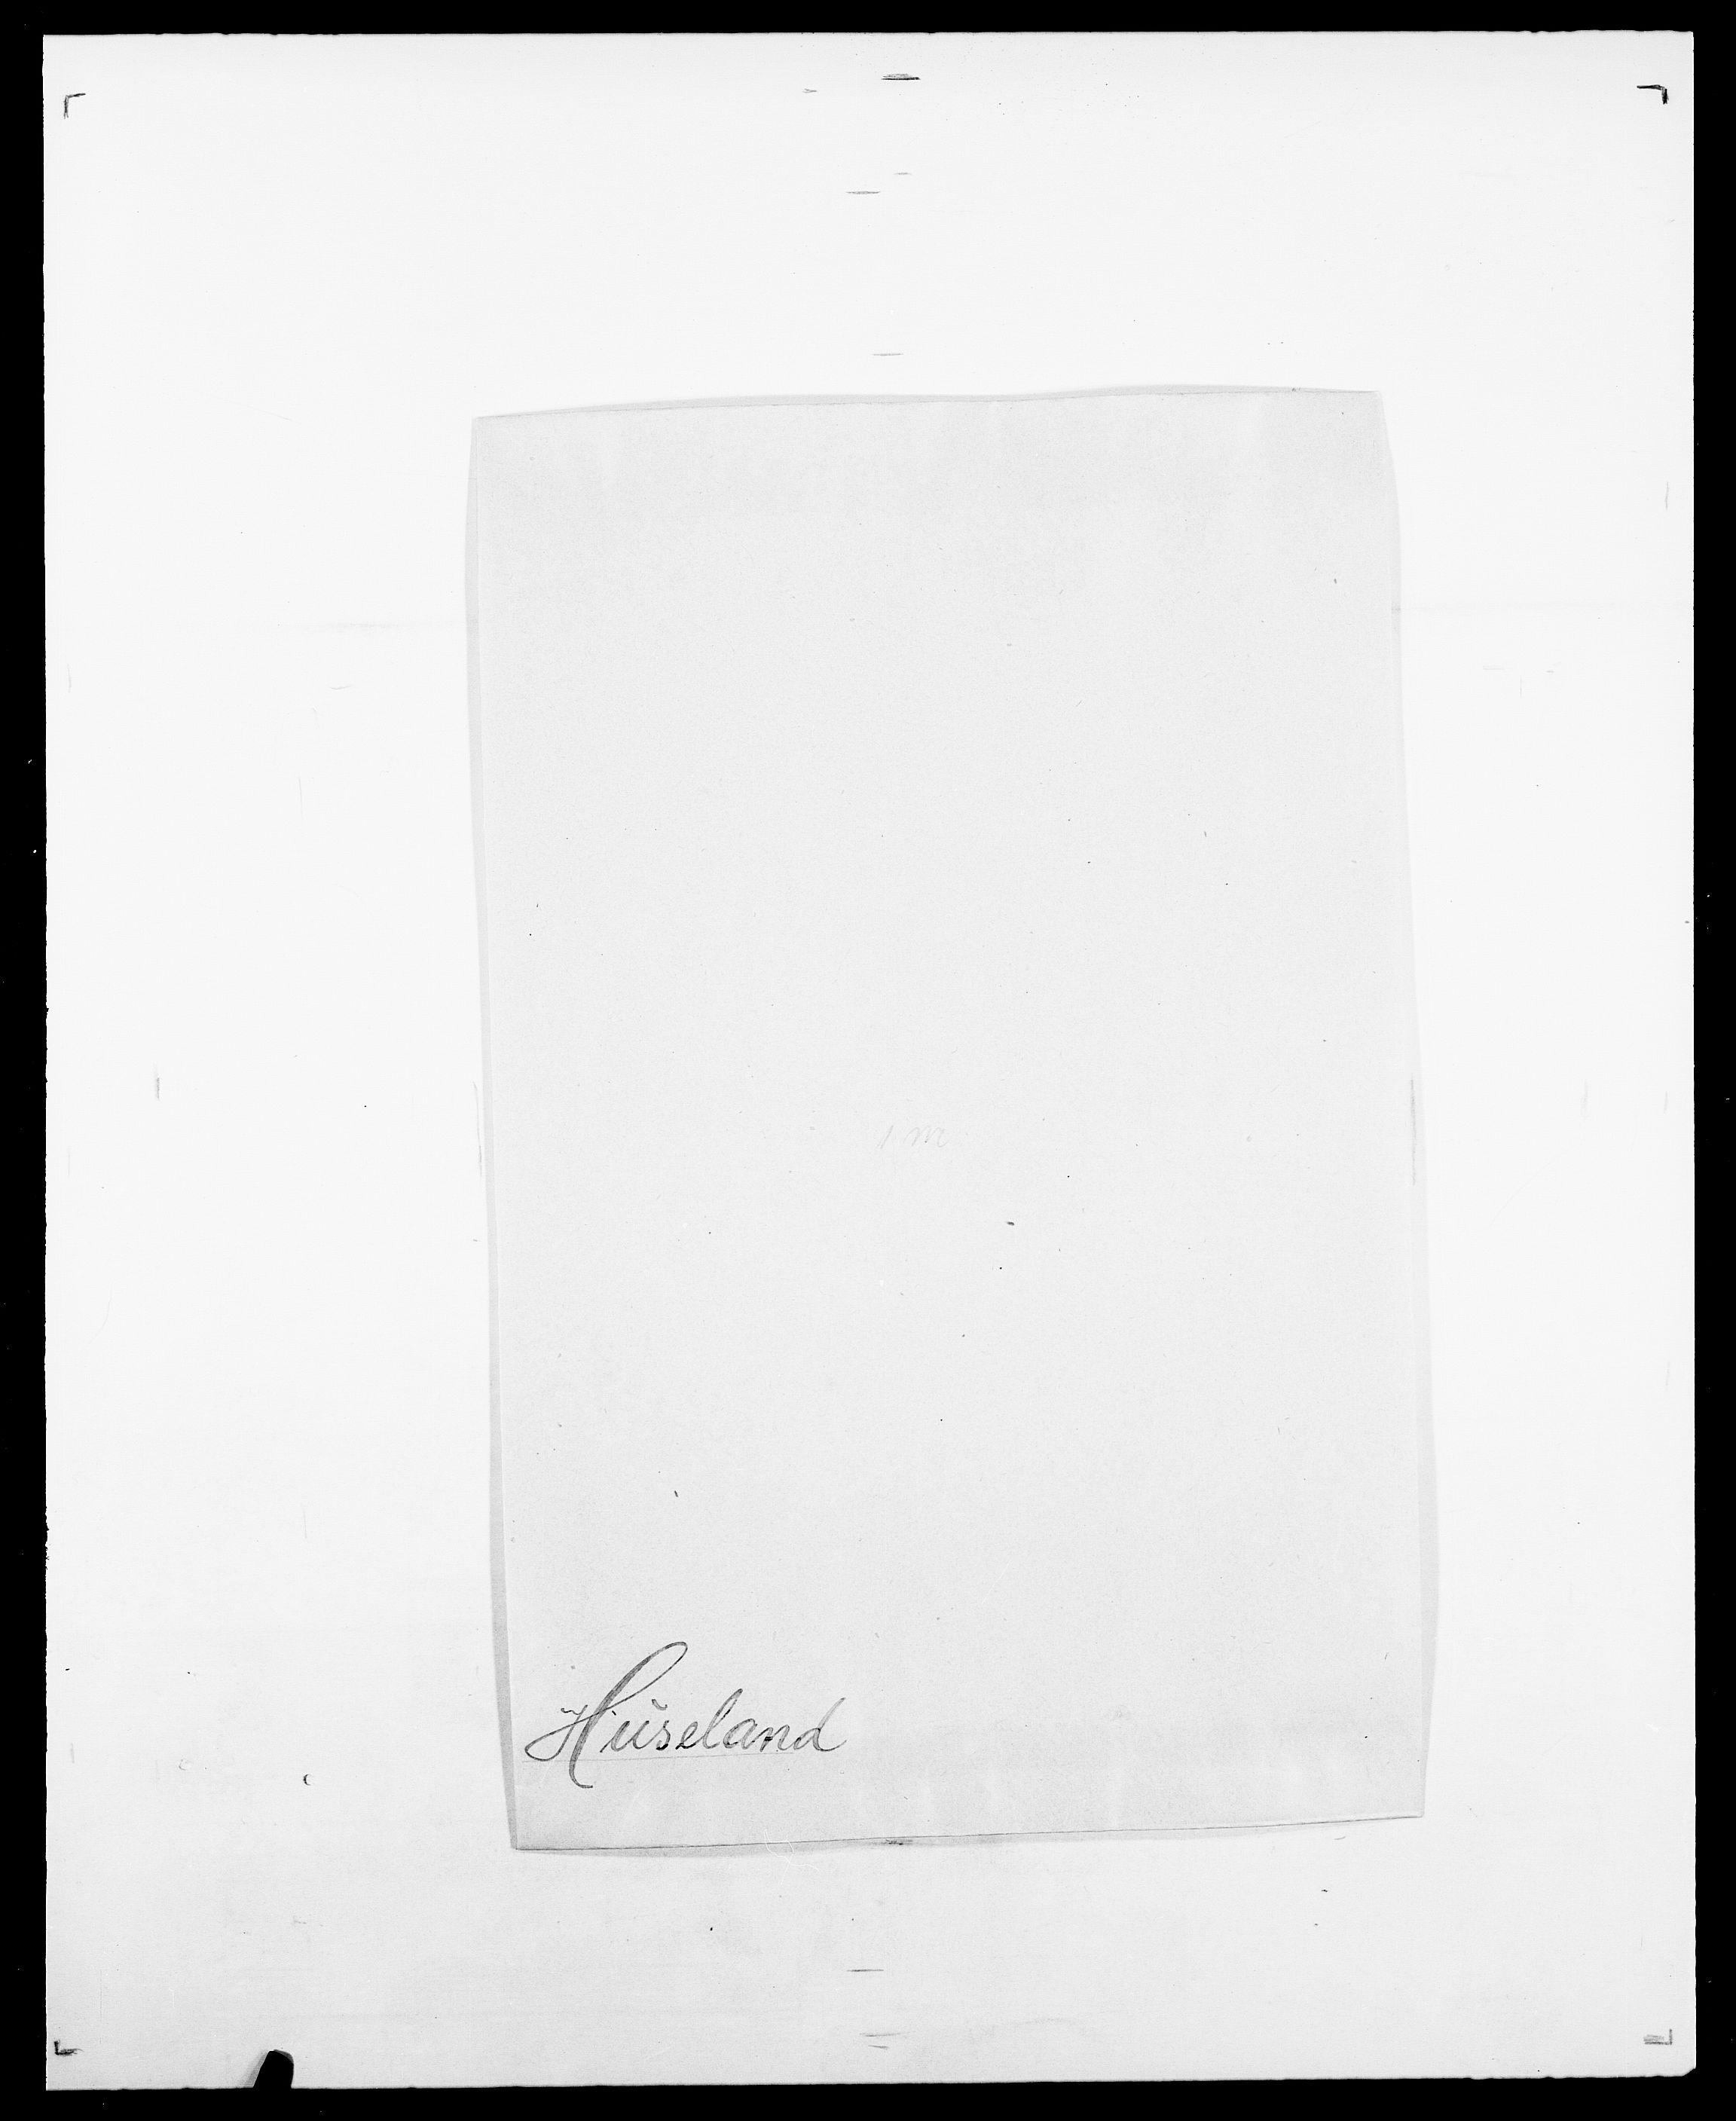 SAO, Delgobe, Charles Antoine - samling, D/Da/L0019: van der Hude - Joys, s. 85